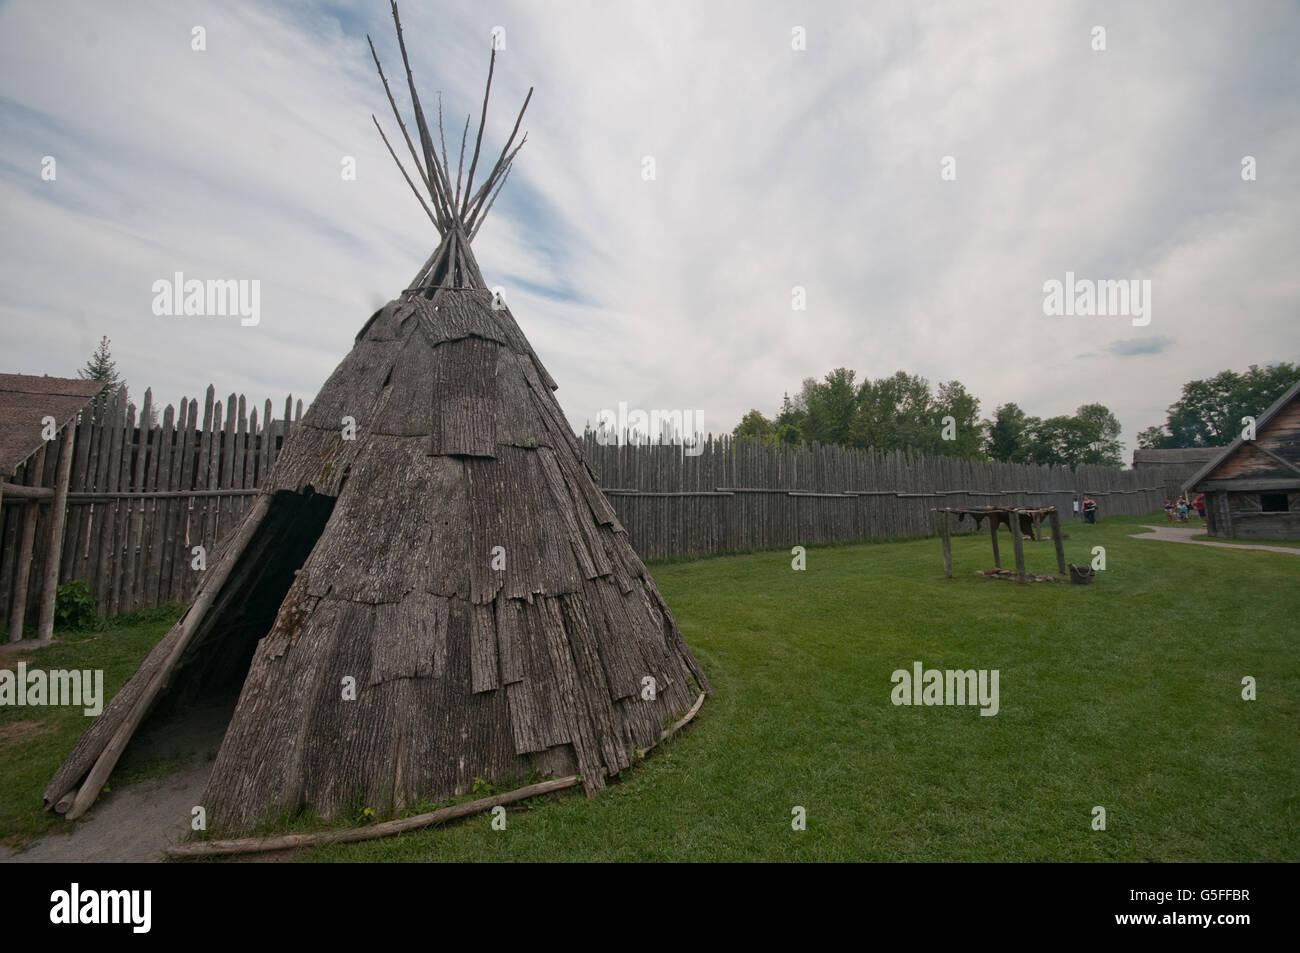 North America, Canada, Ontario, Sainte-Marie among the Hurons - Stock Image